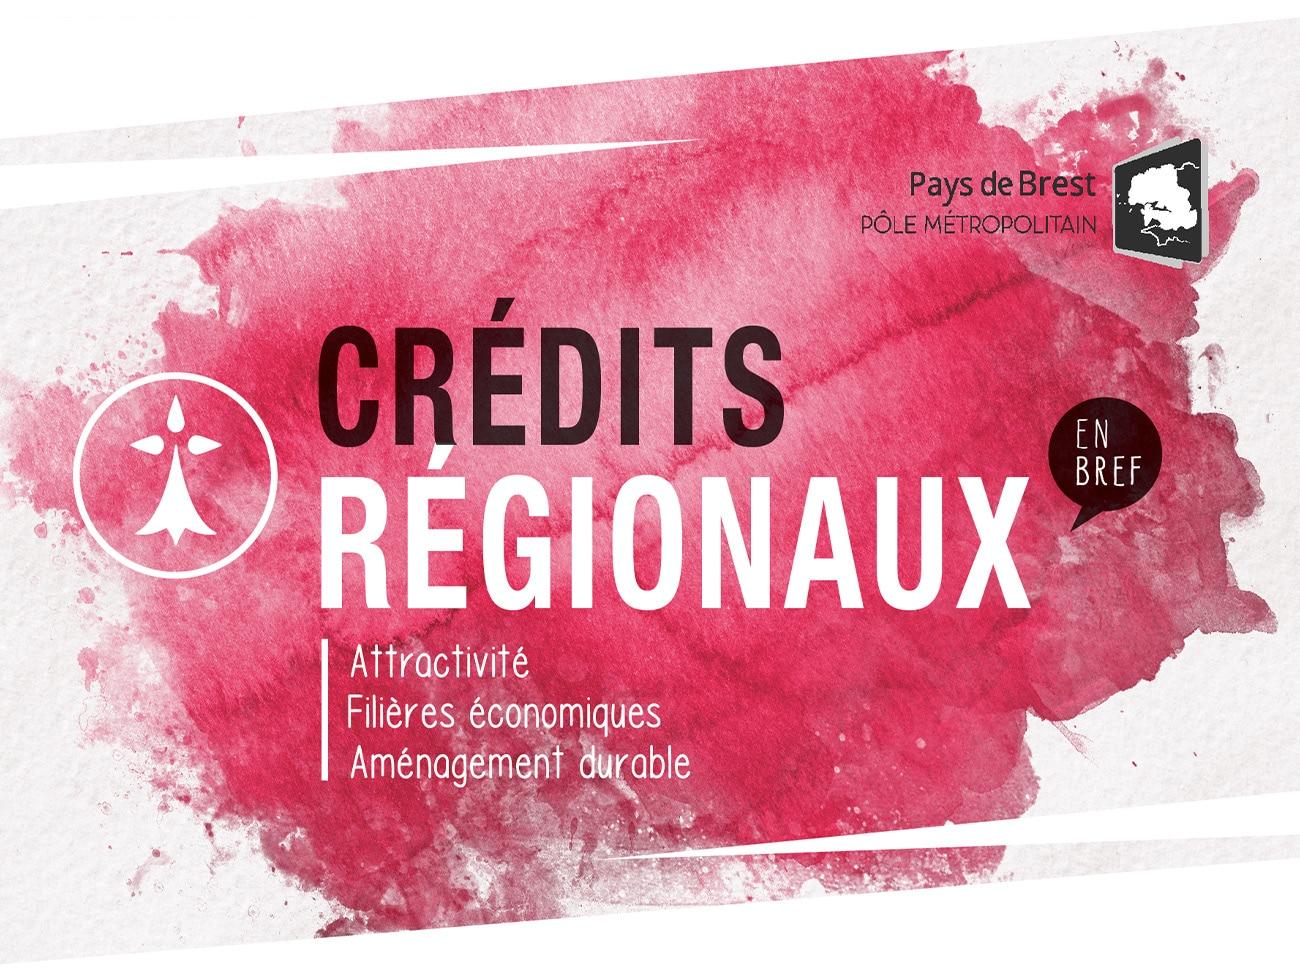 5-pole-metropolitain-campagne-fonds-communication-bretagne-lorient-credits-regionaux